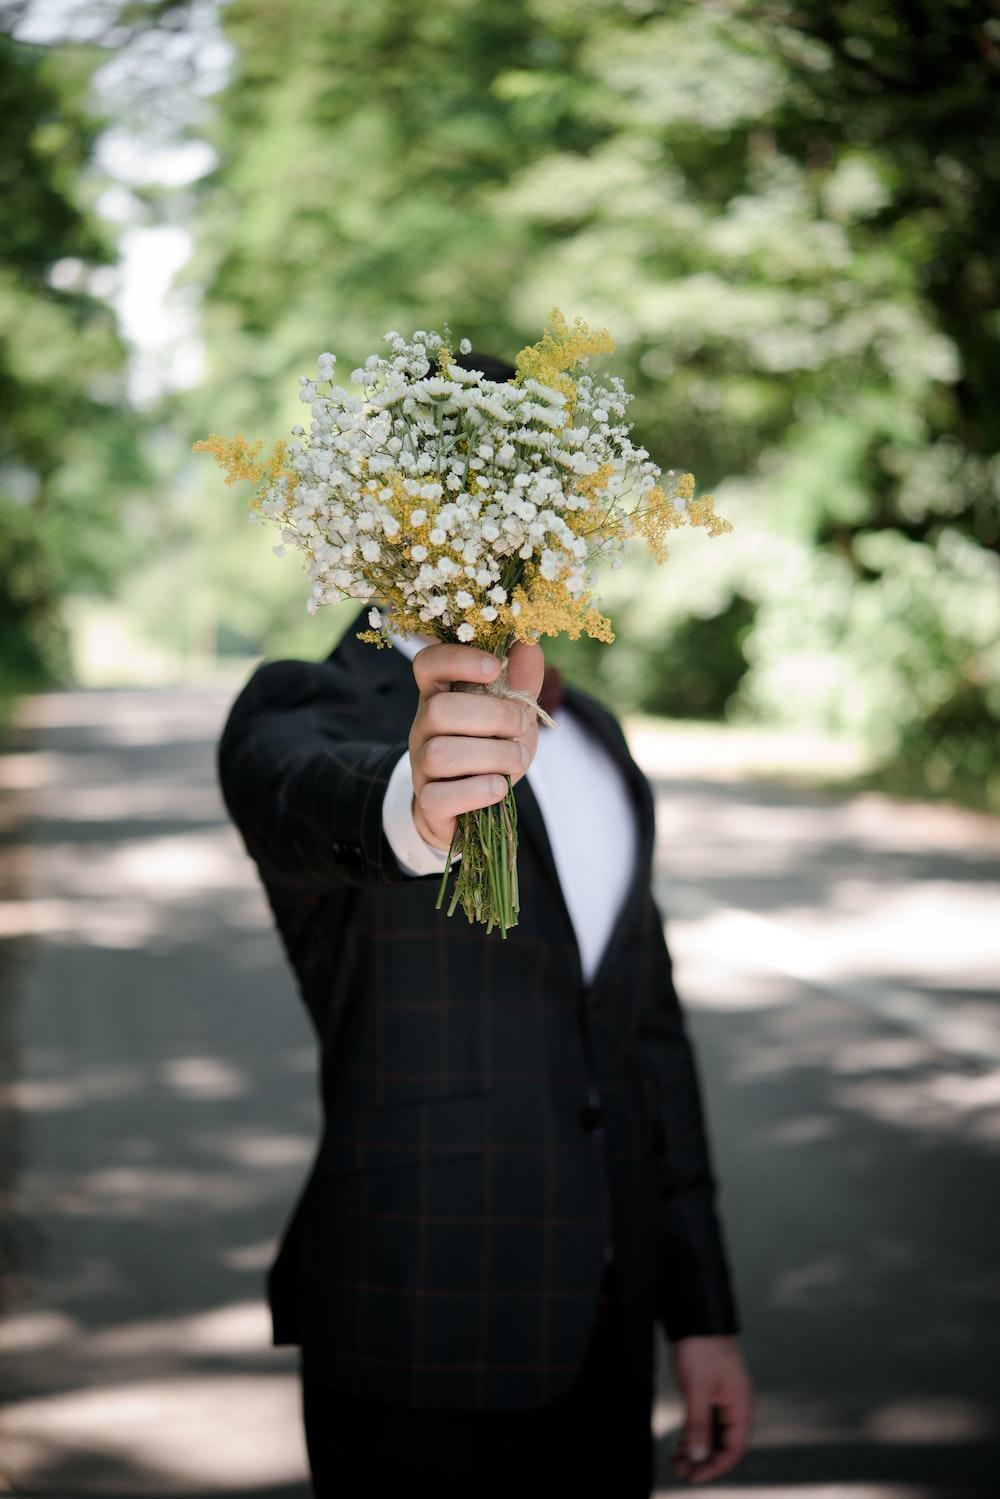 selective focus photo of man wearing black suit jacket holding flower bouquet